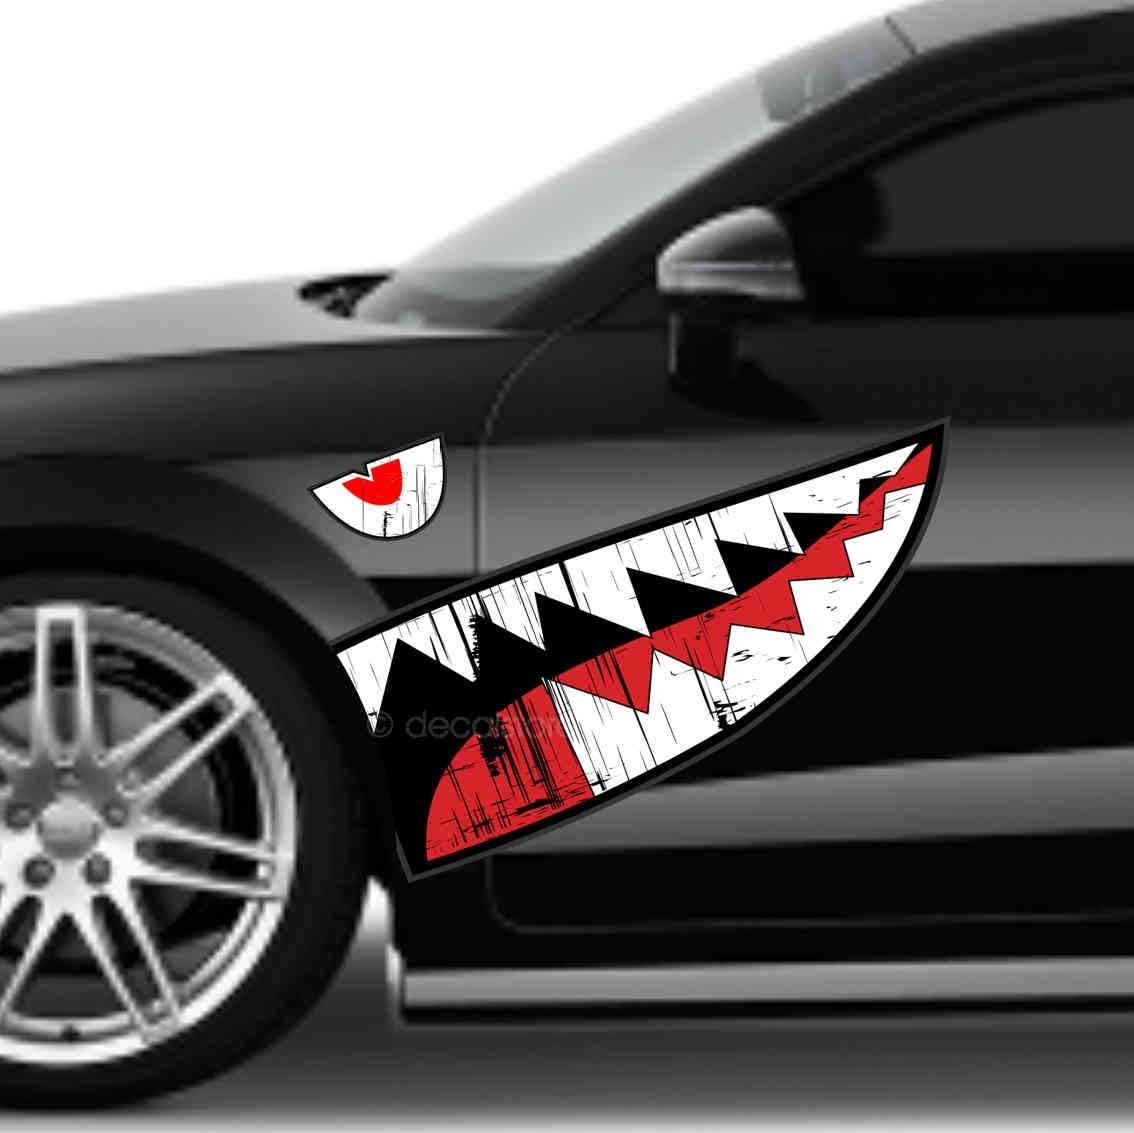 Decalstore Auto Aufkleber Haifisch Maul Shark Face Bomber Ww2 Zähne Folierung Auto